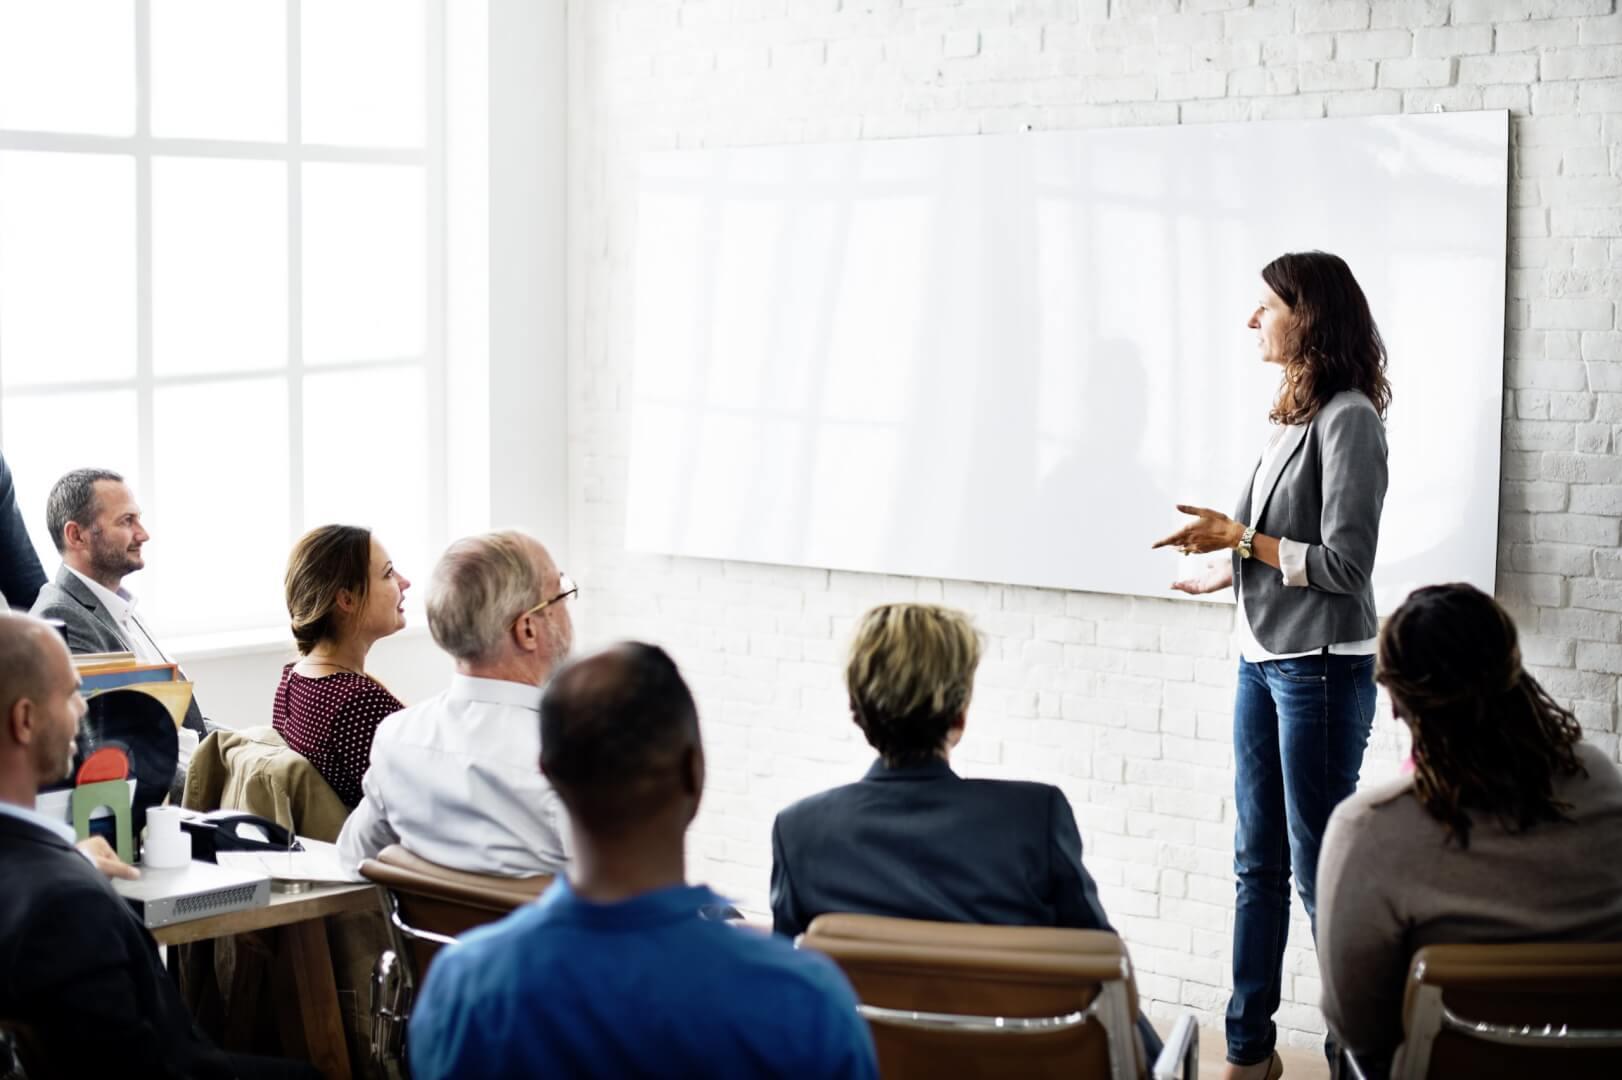 Vordiplomlehrgang, Dipl. Coach in Organisationen - Modul 2